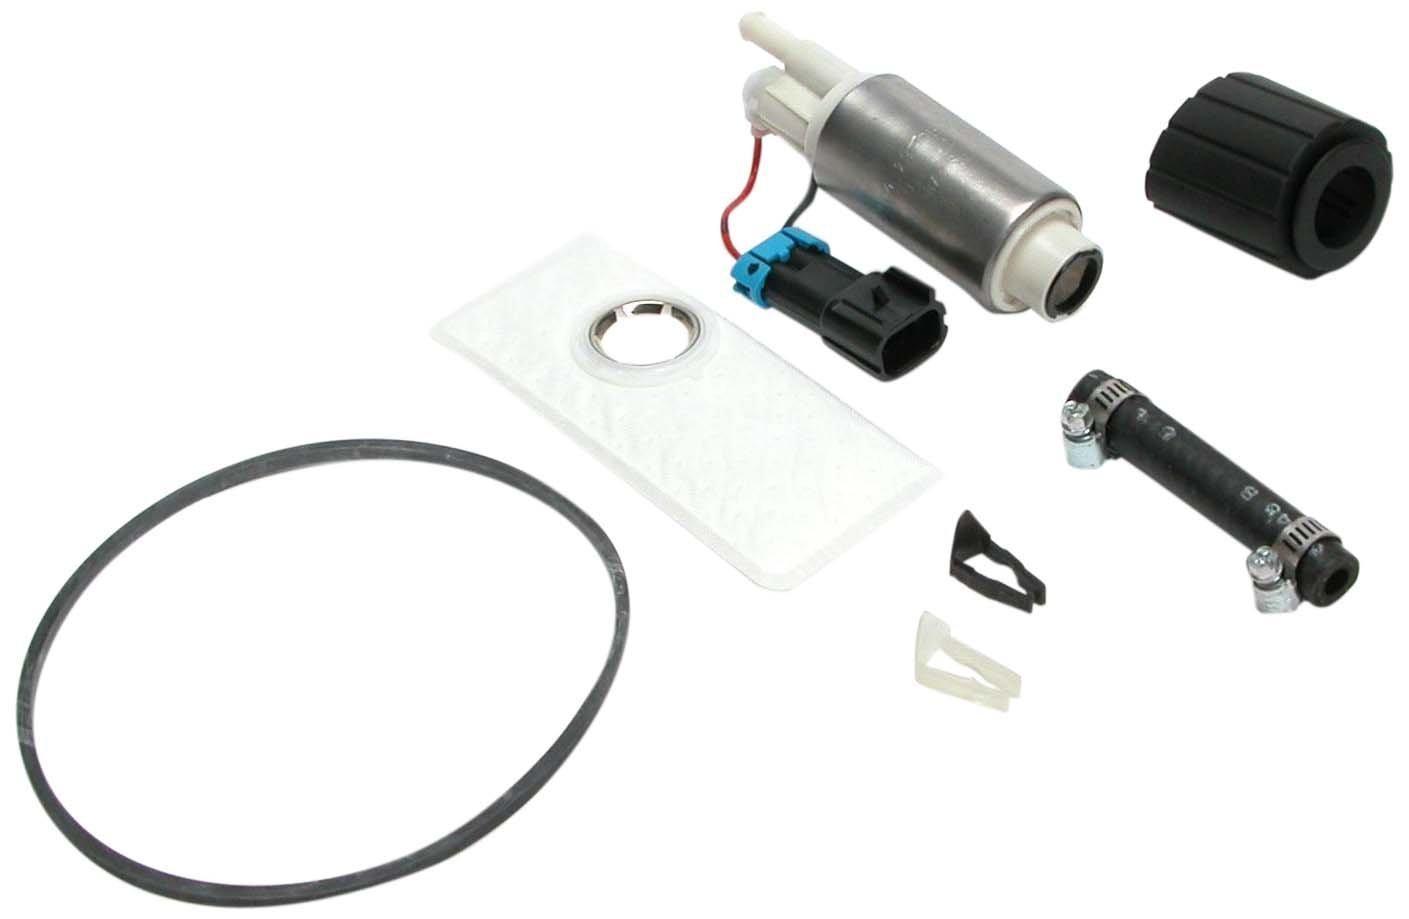 Magneti Marelli by Mopar 1AMFP00128 Fuel Pump and Strainer Set